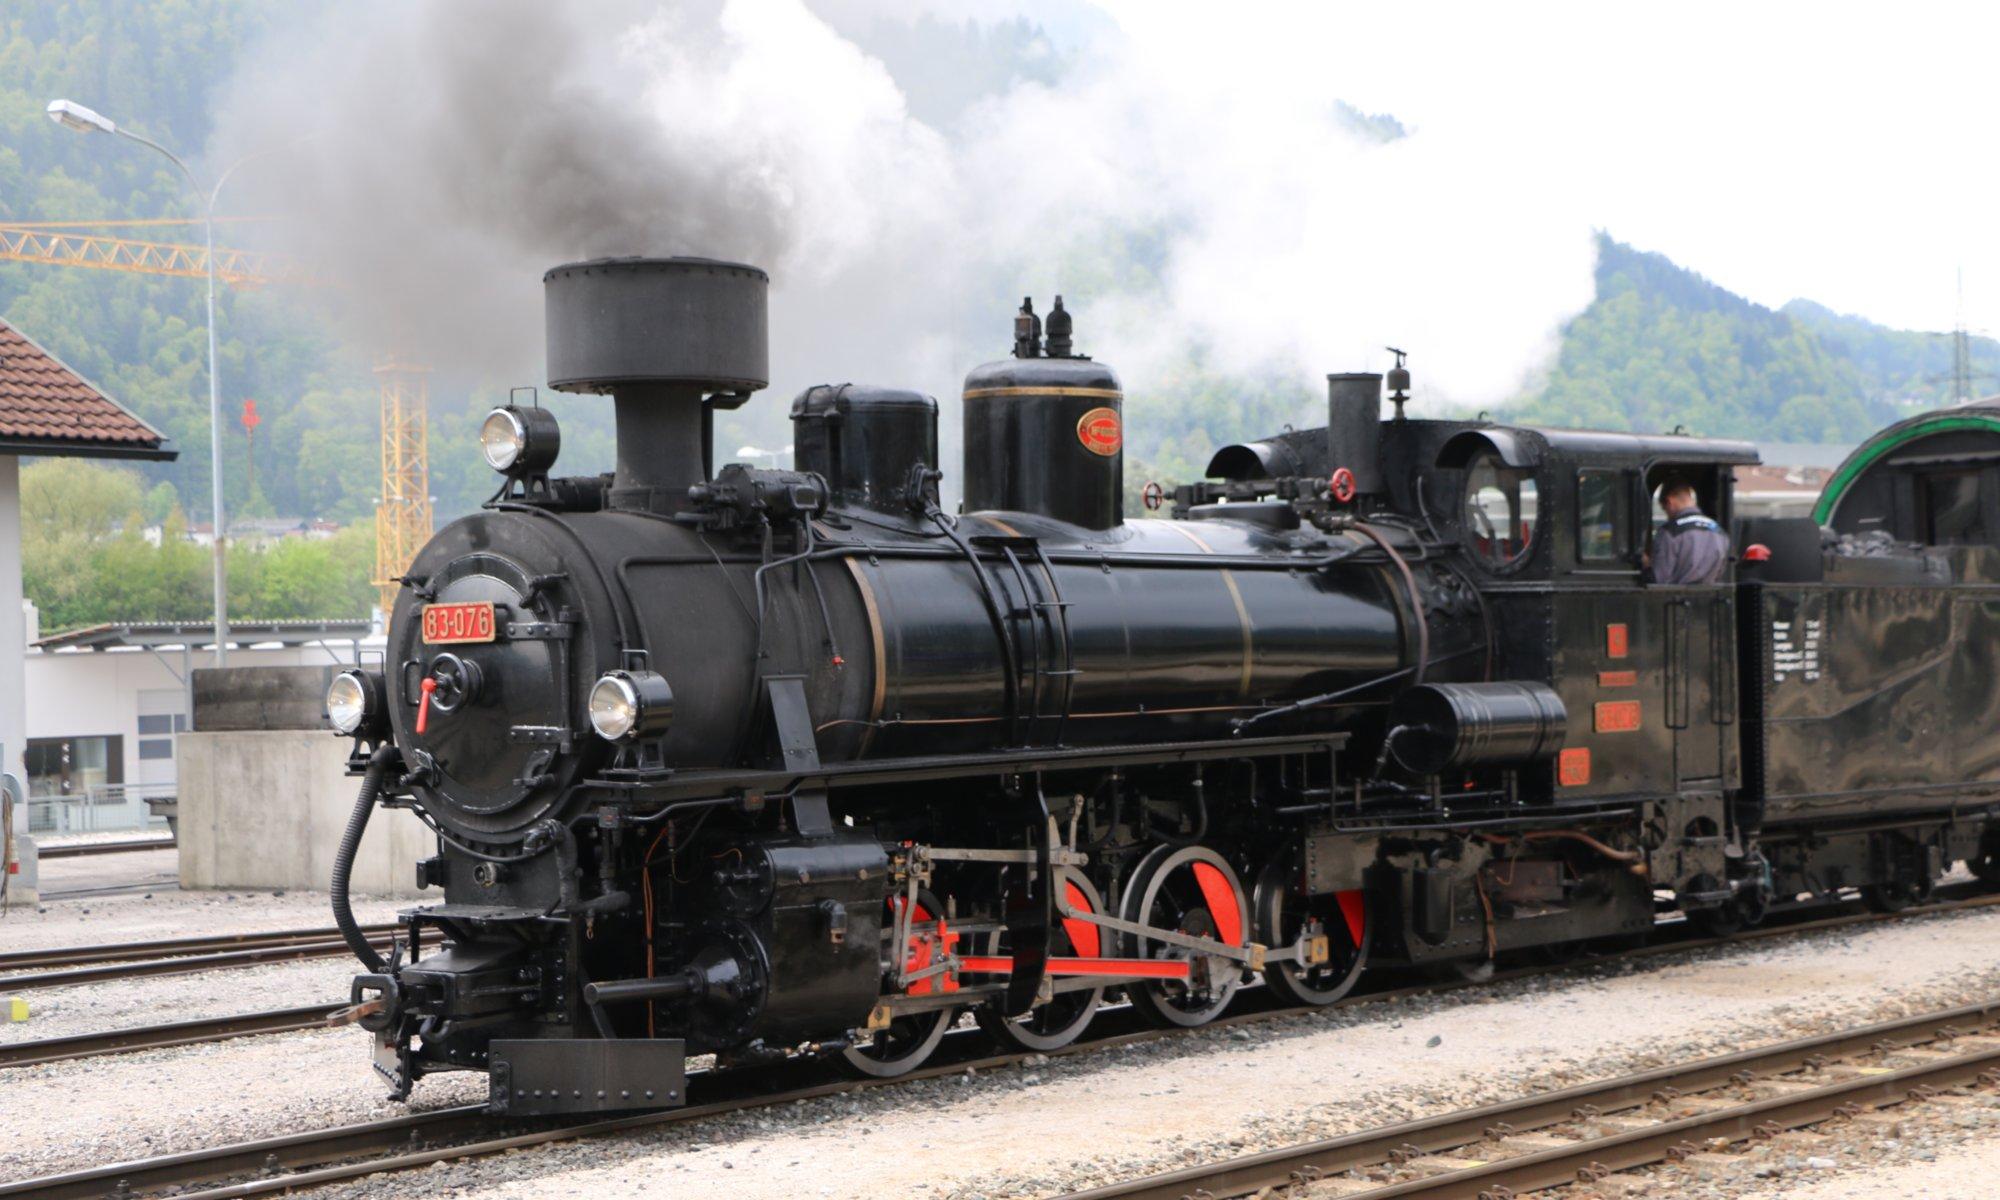 Zillertalbahn, Jenbach